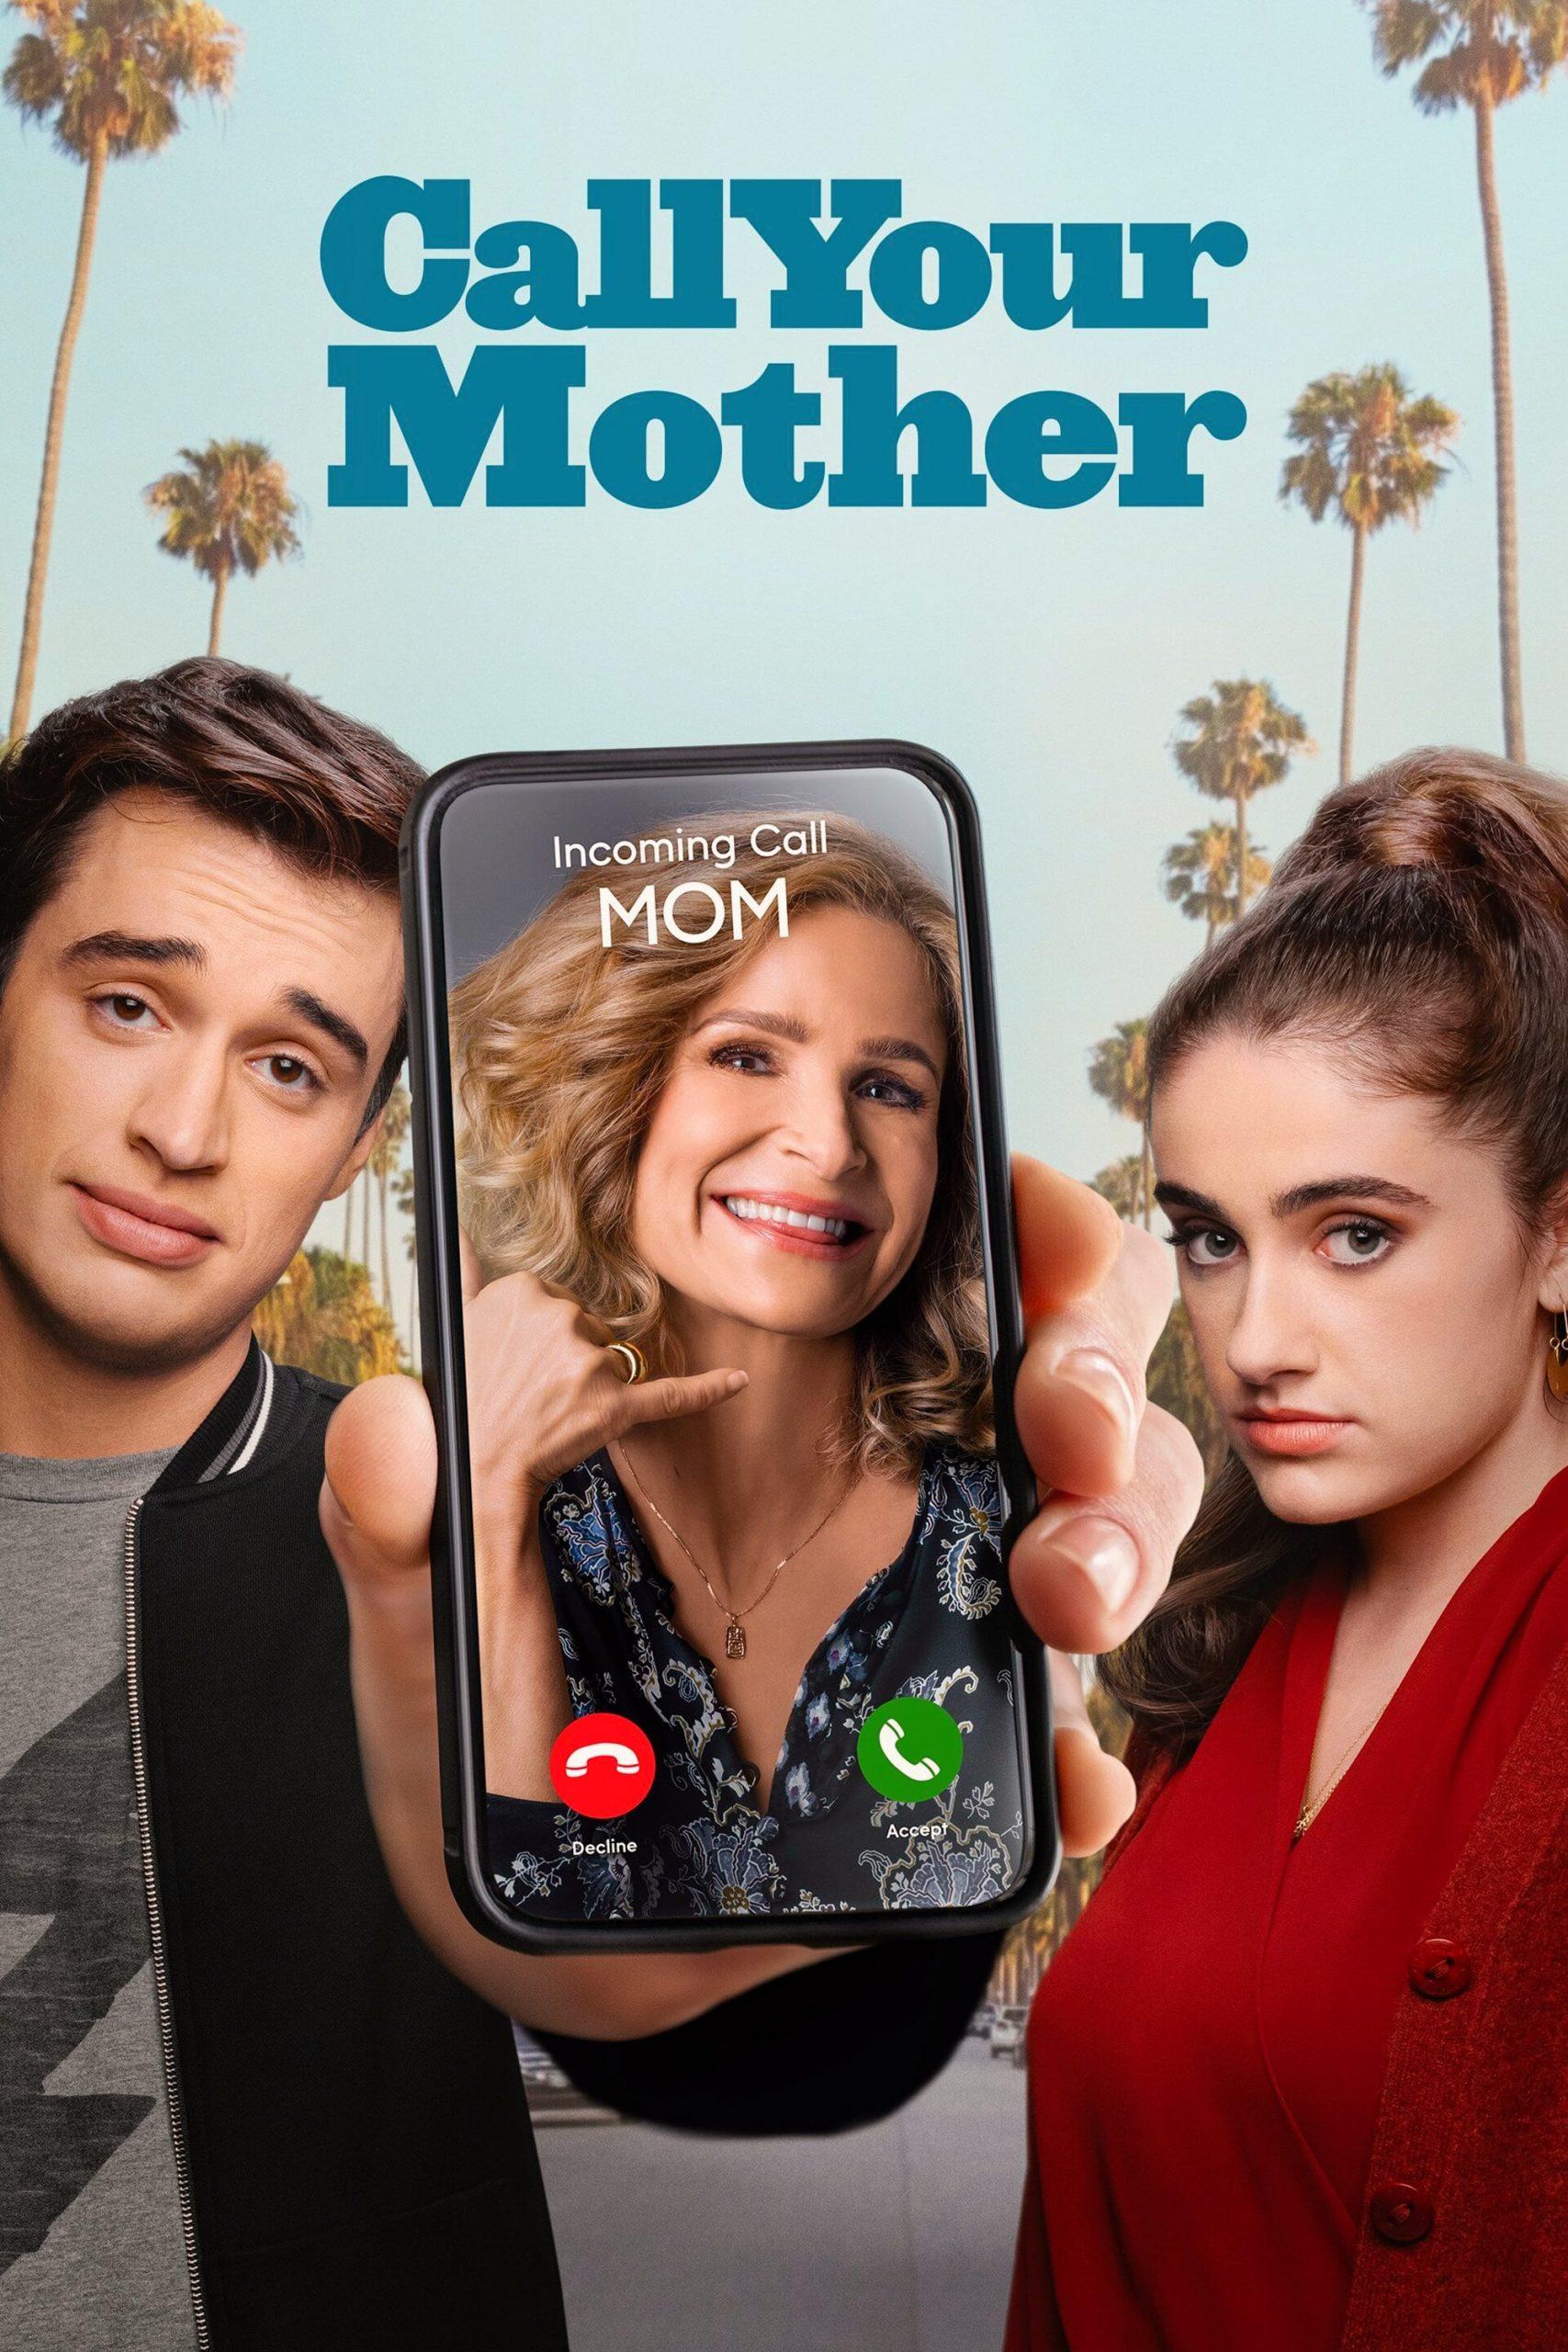 Image mom-26162-episode-3-season-6.jpg